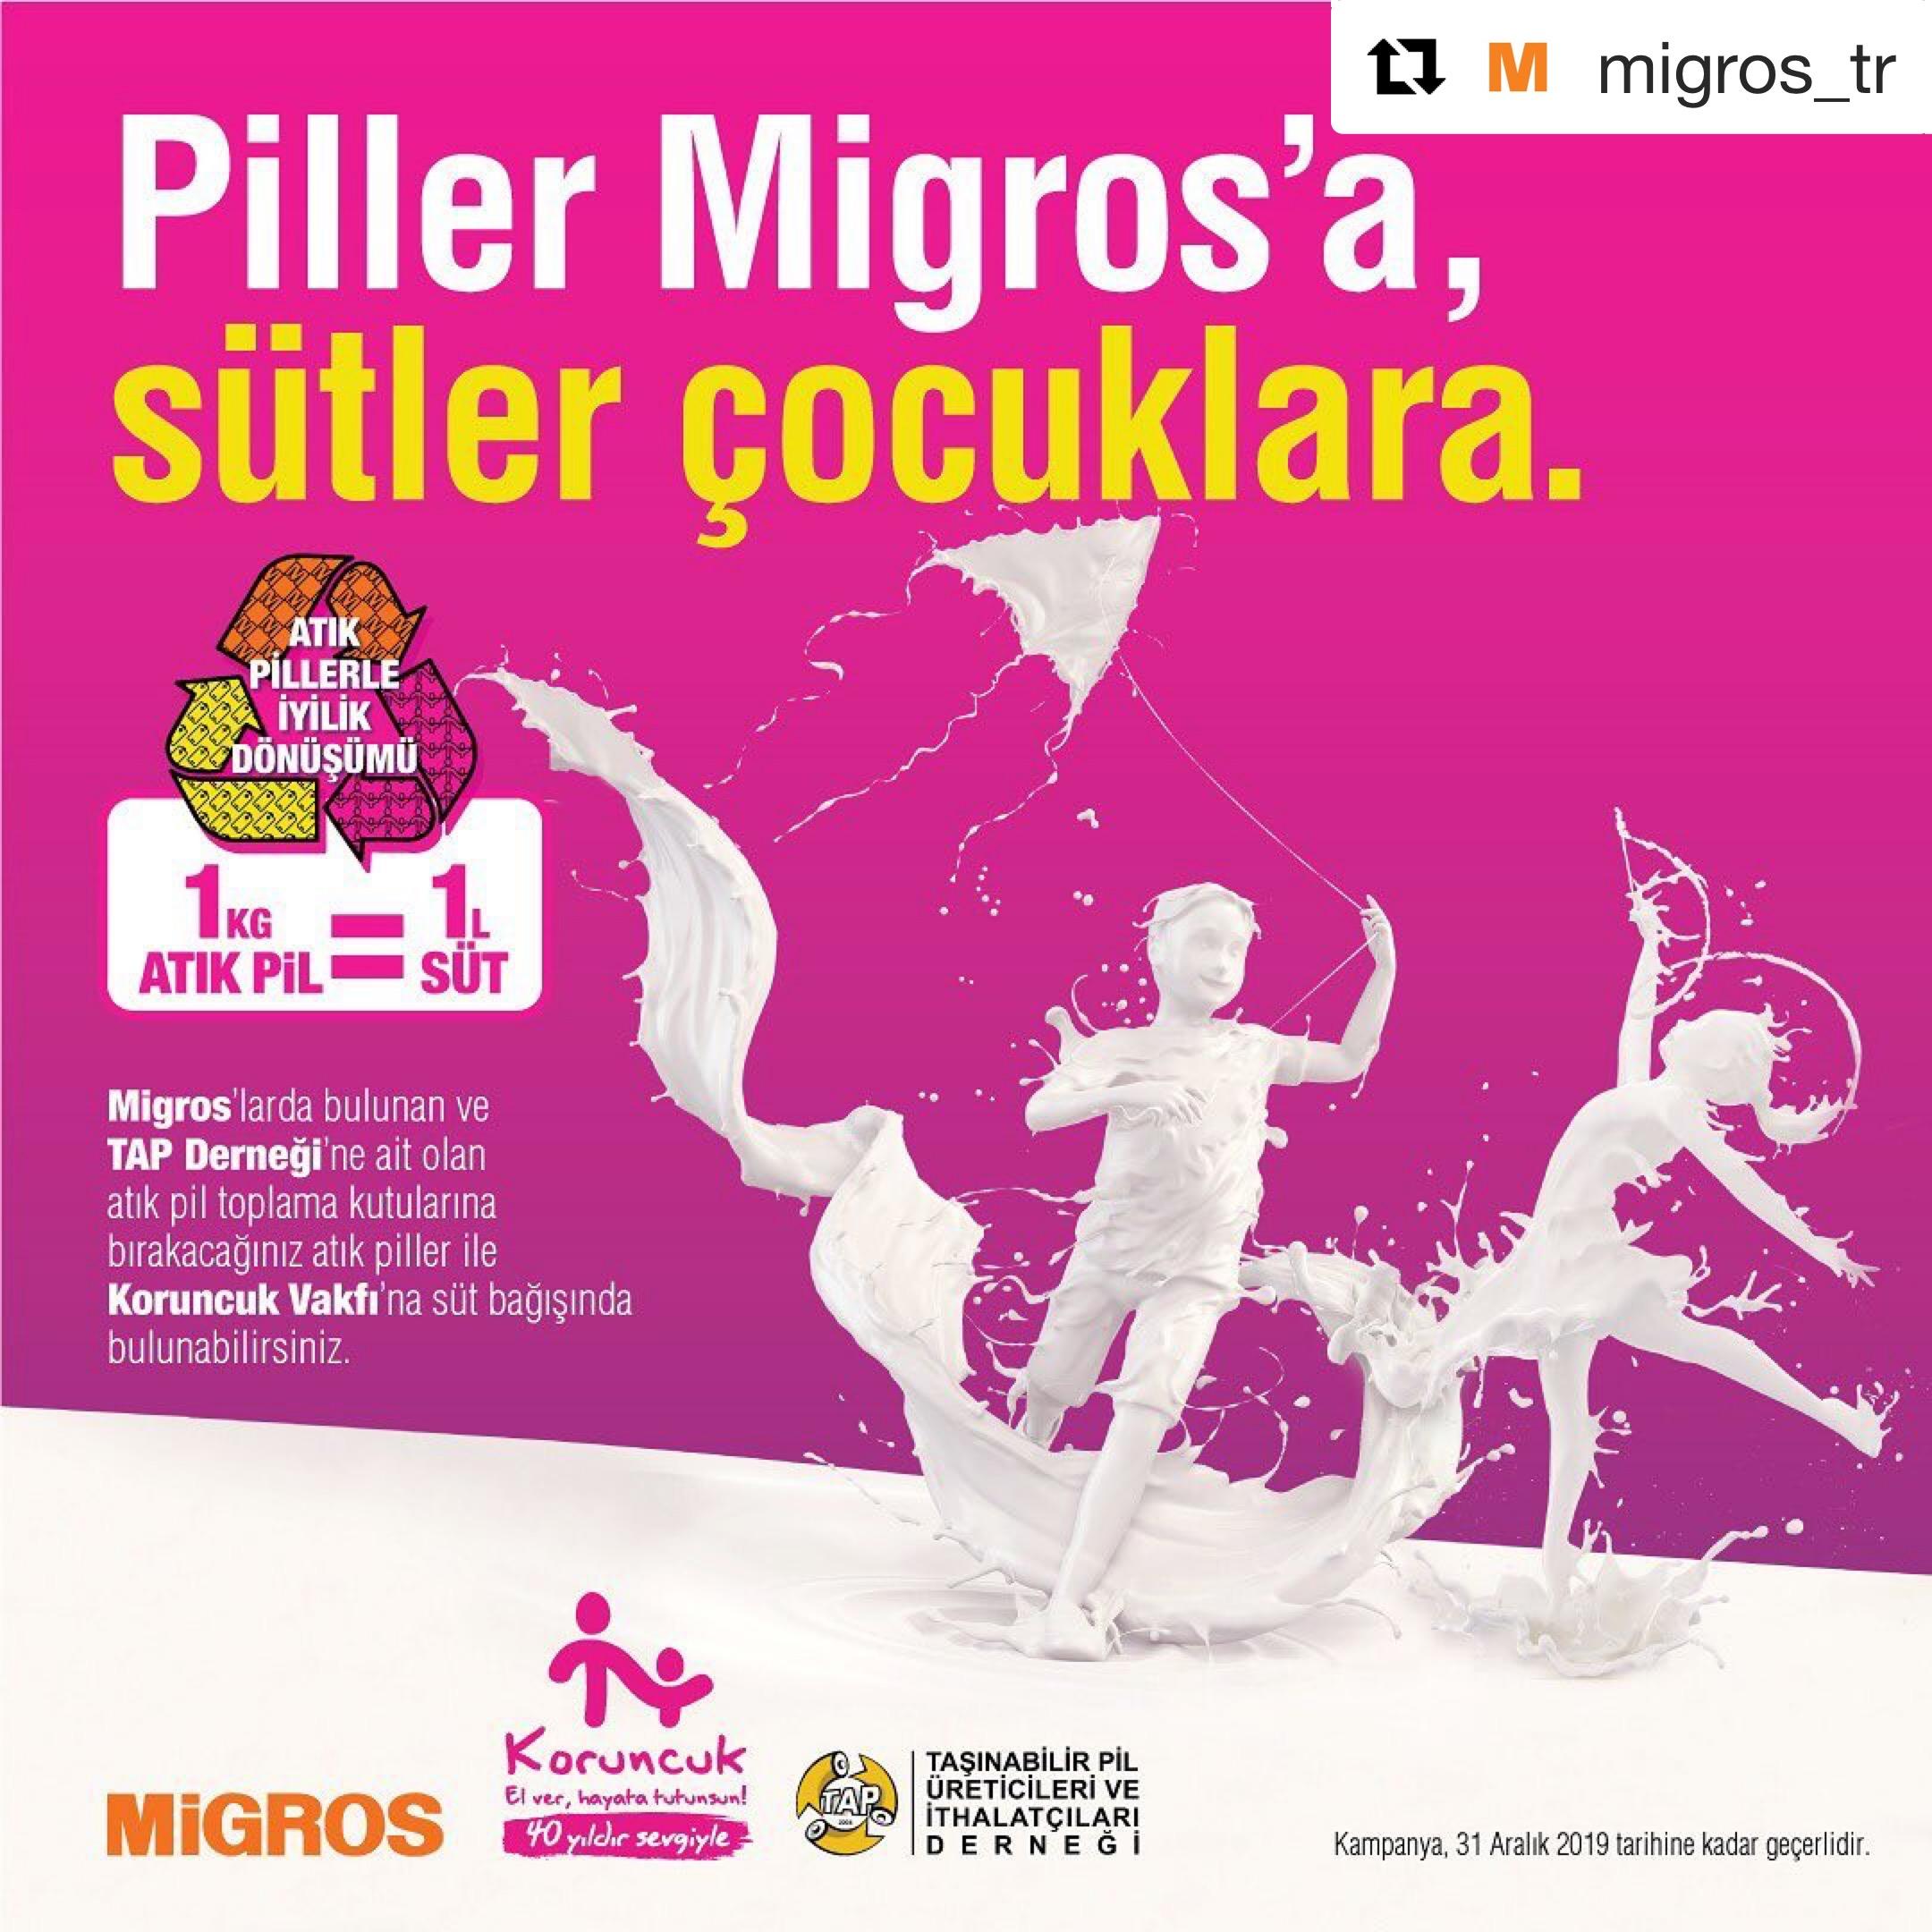 TAP Migros Pili getir sütü götür kampanya afişi